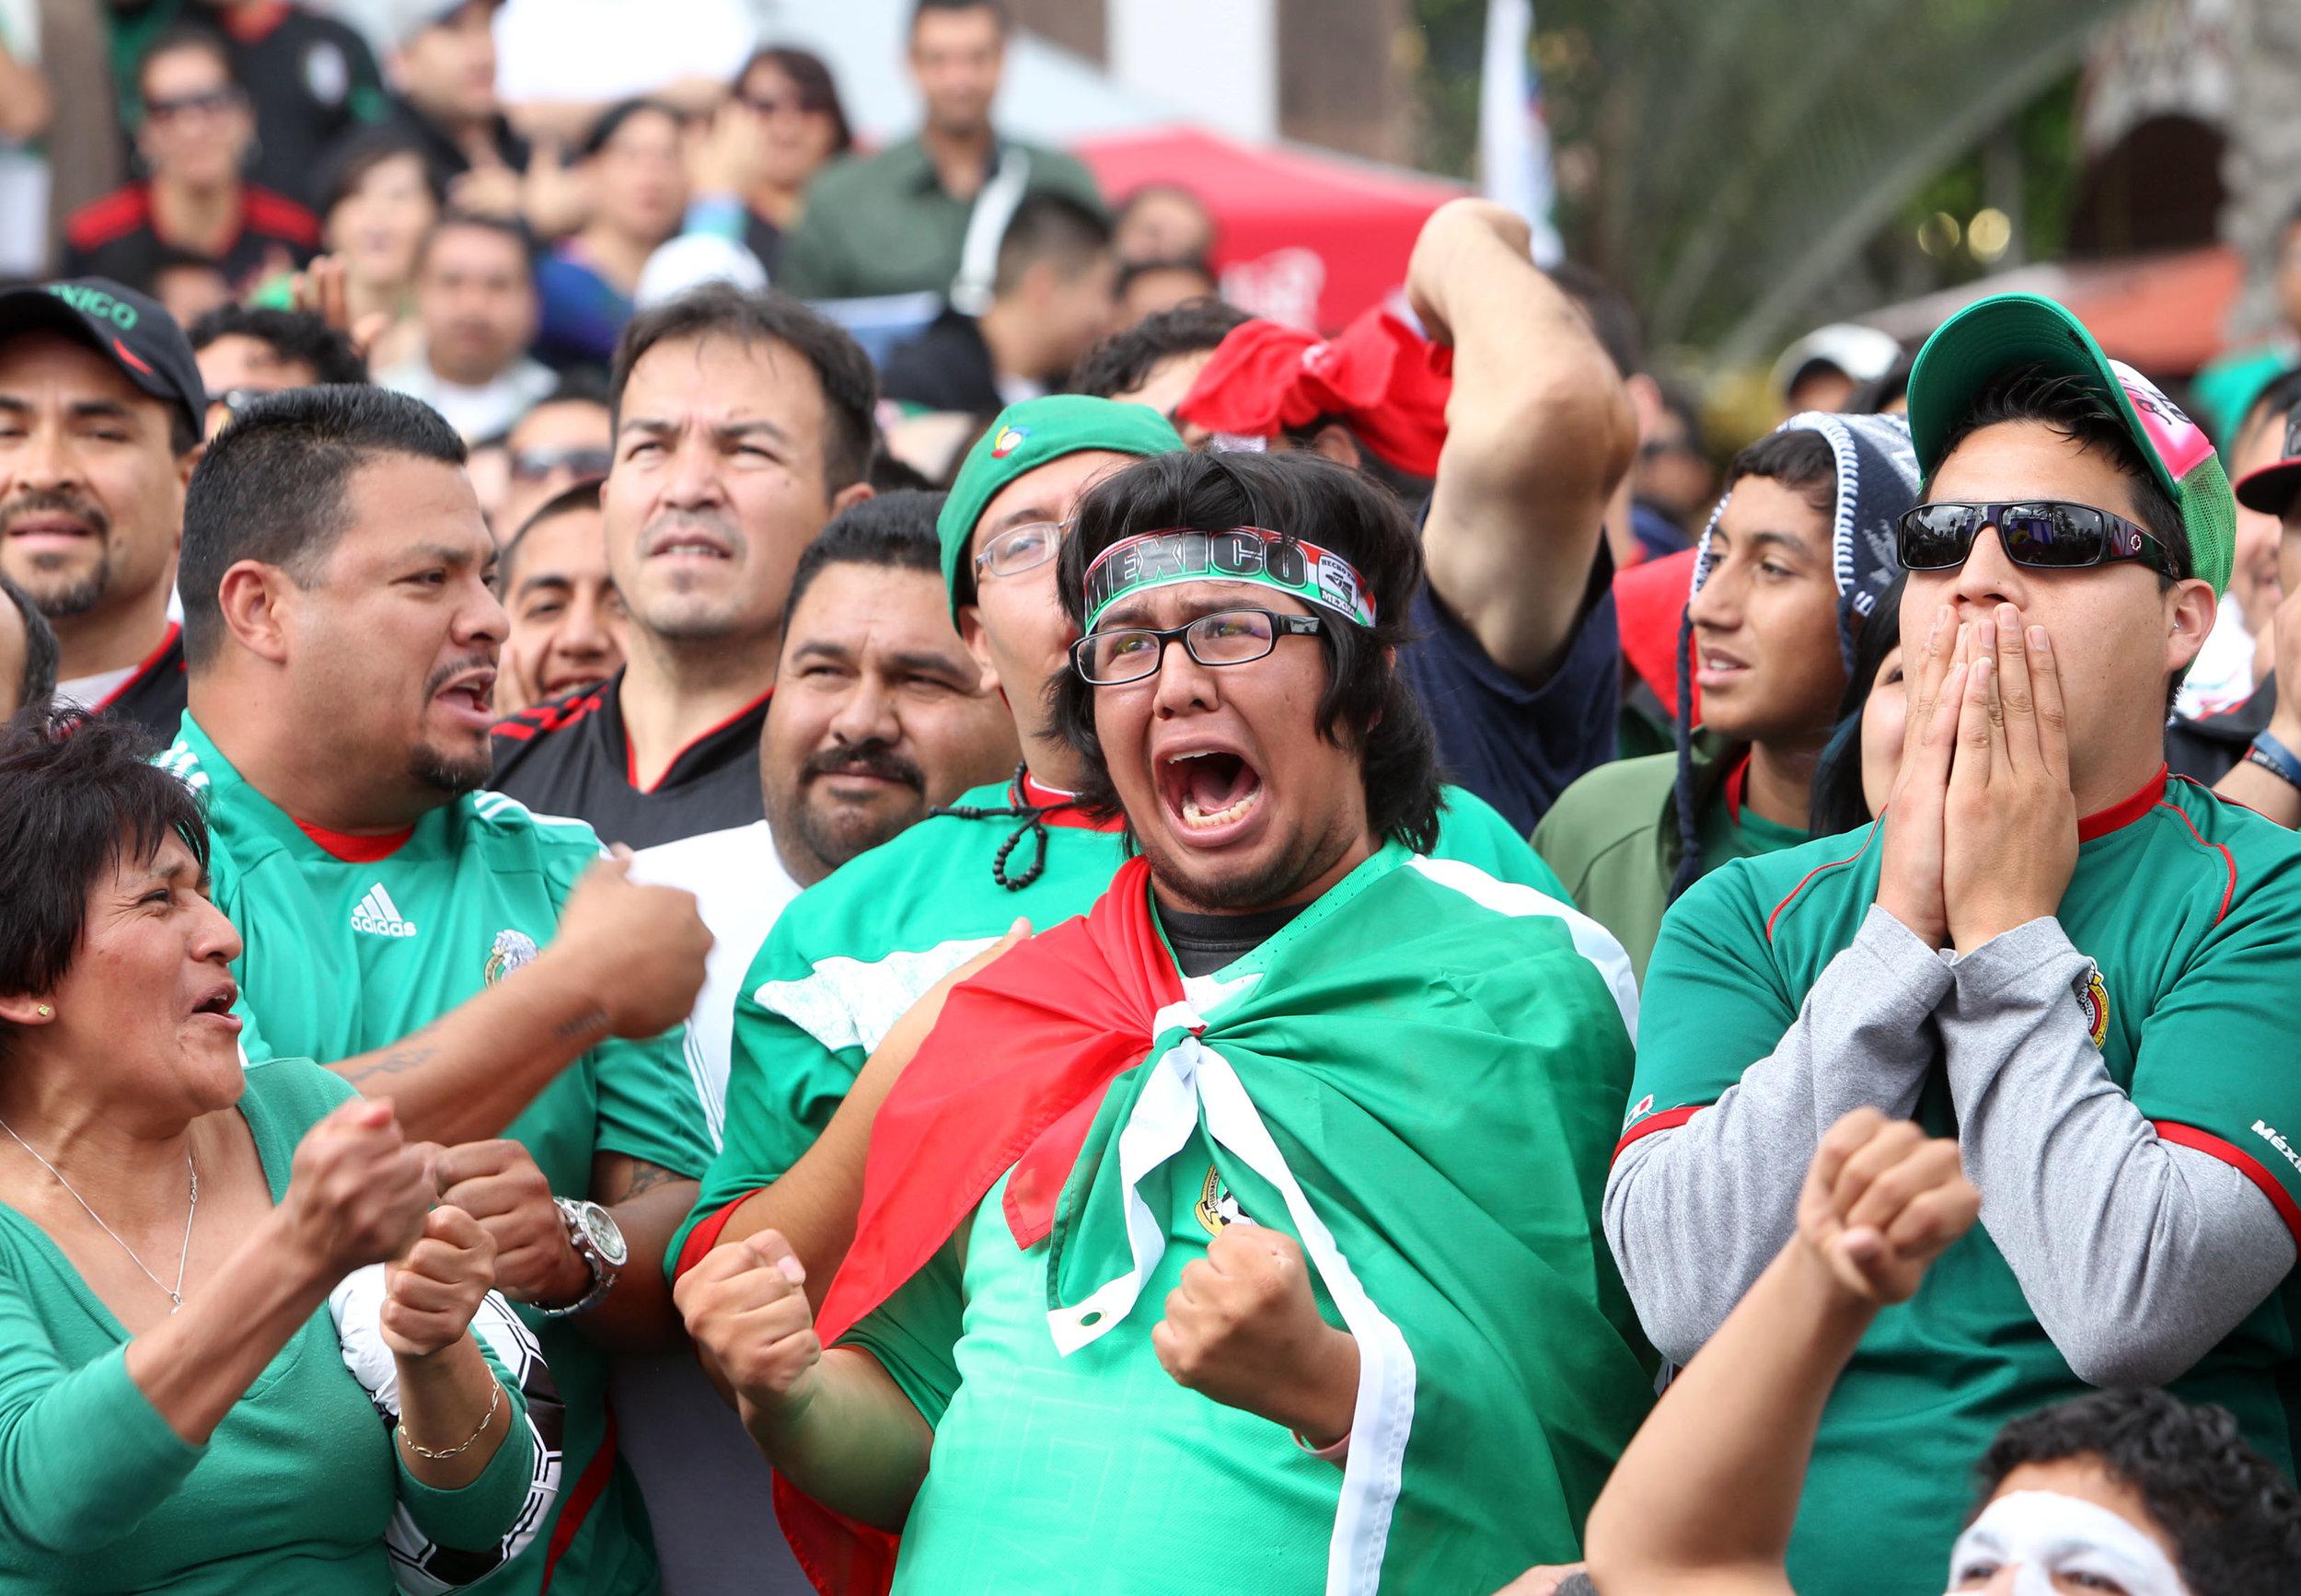 Pasion del Futbol. 004.JPG